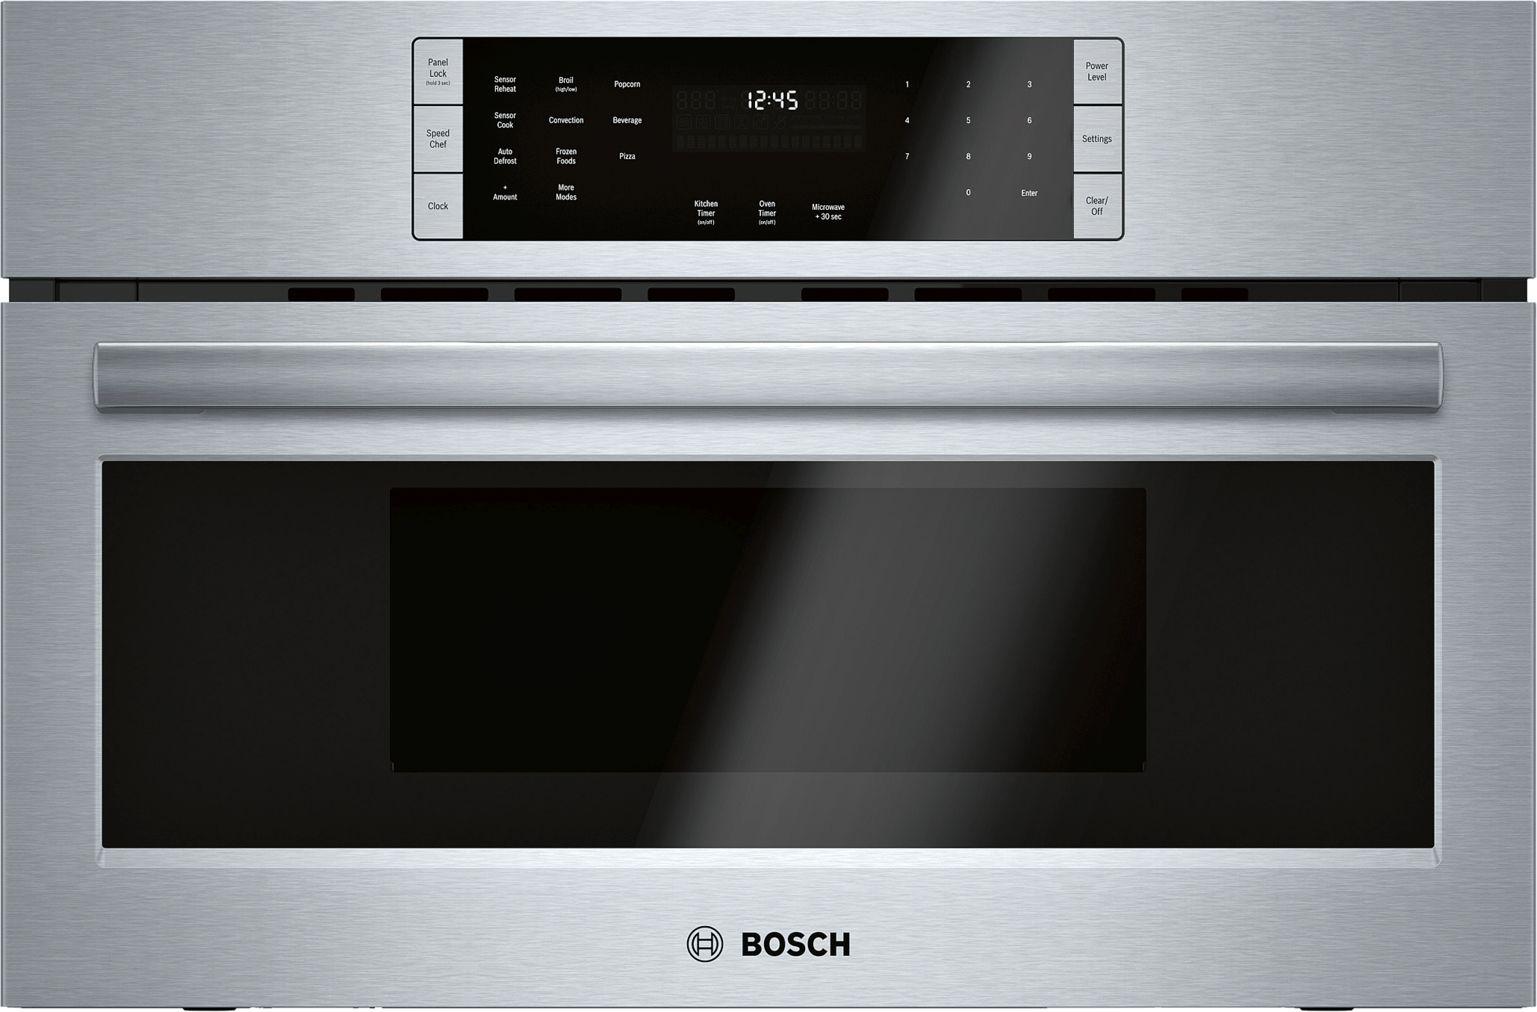 matterns ridge appliances